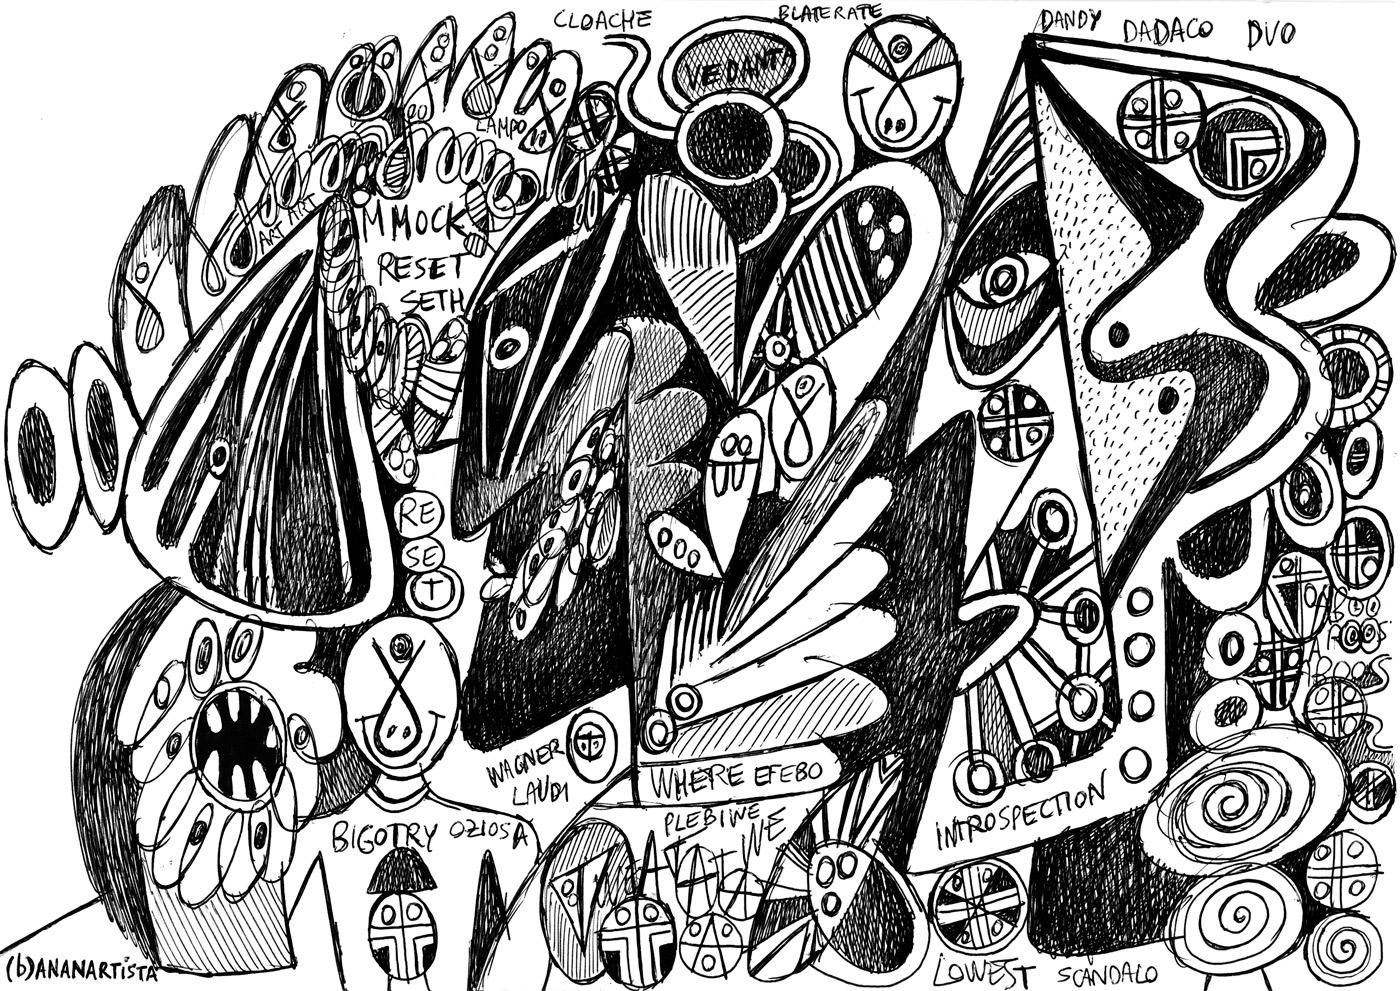 dandy efebo introspection - artwork by (b)ananartista sbuff